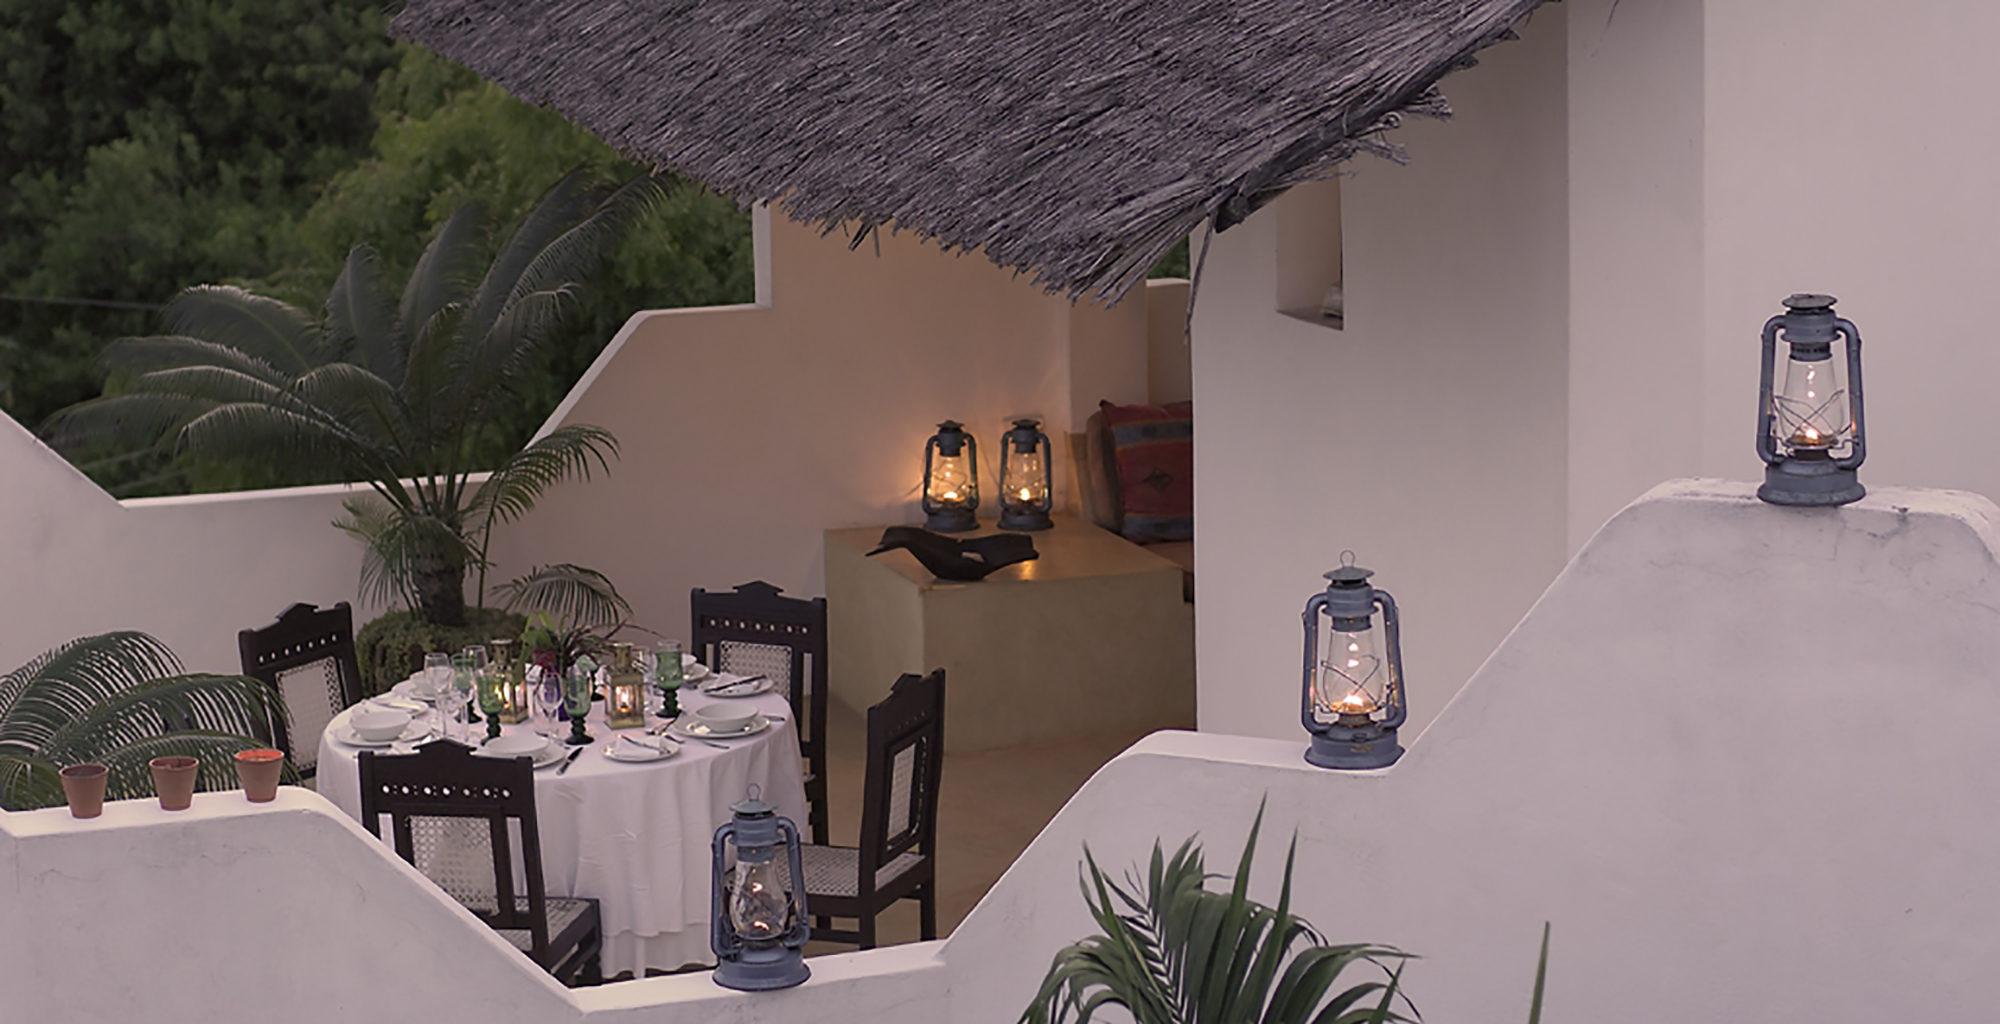 Kenya-Shela-And-Palm-House-Dining-Outdoors